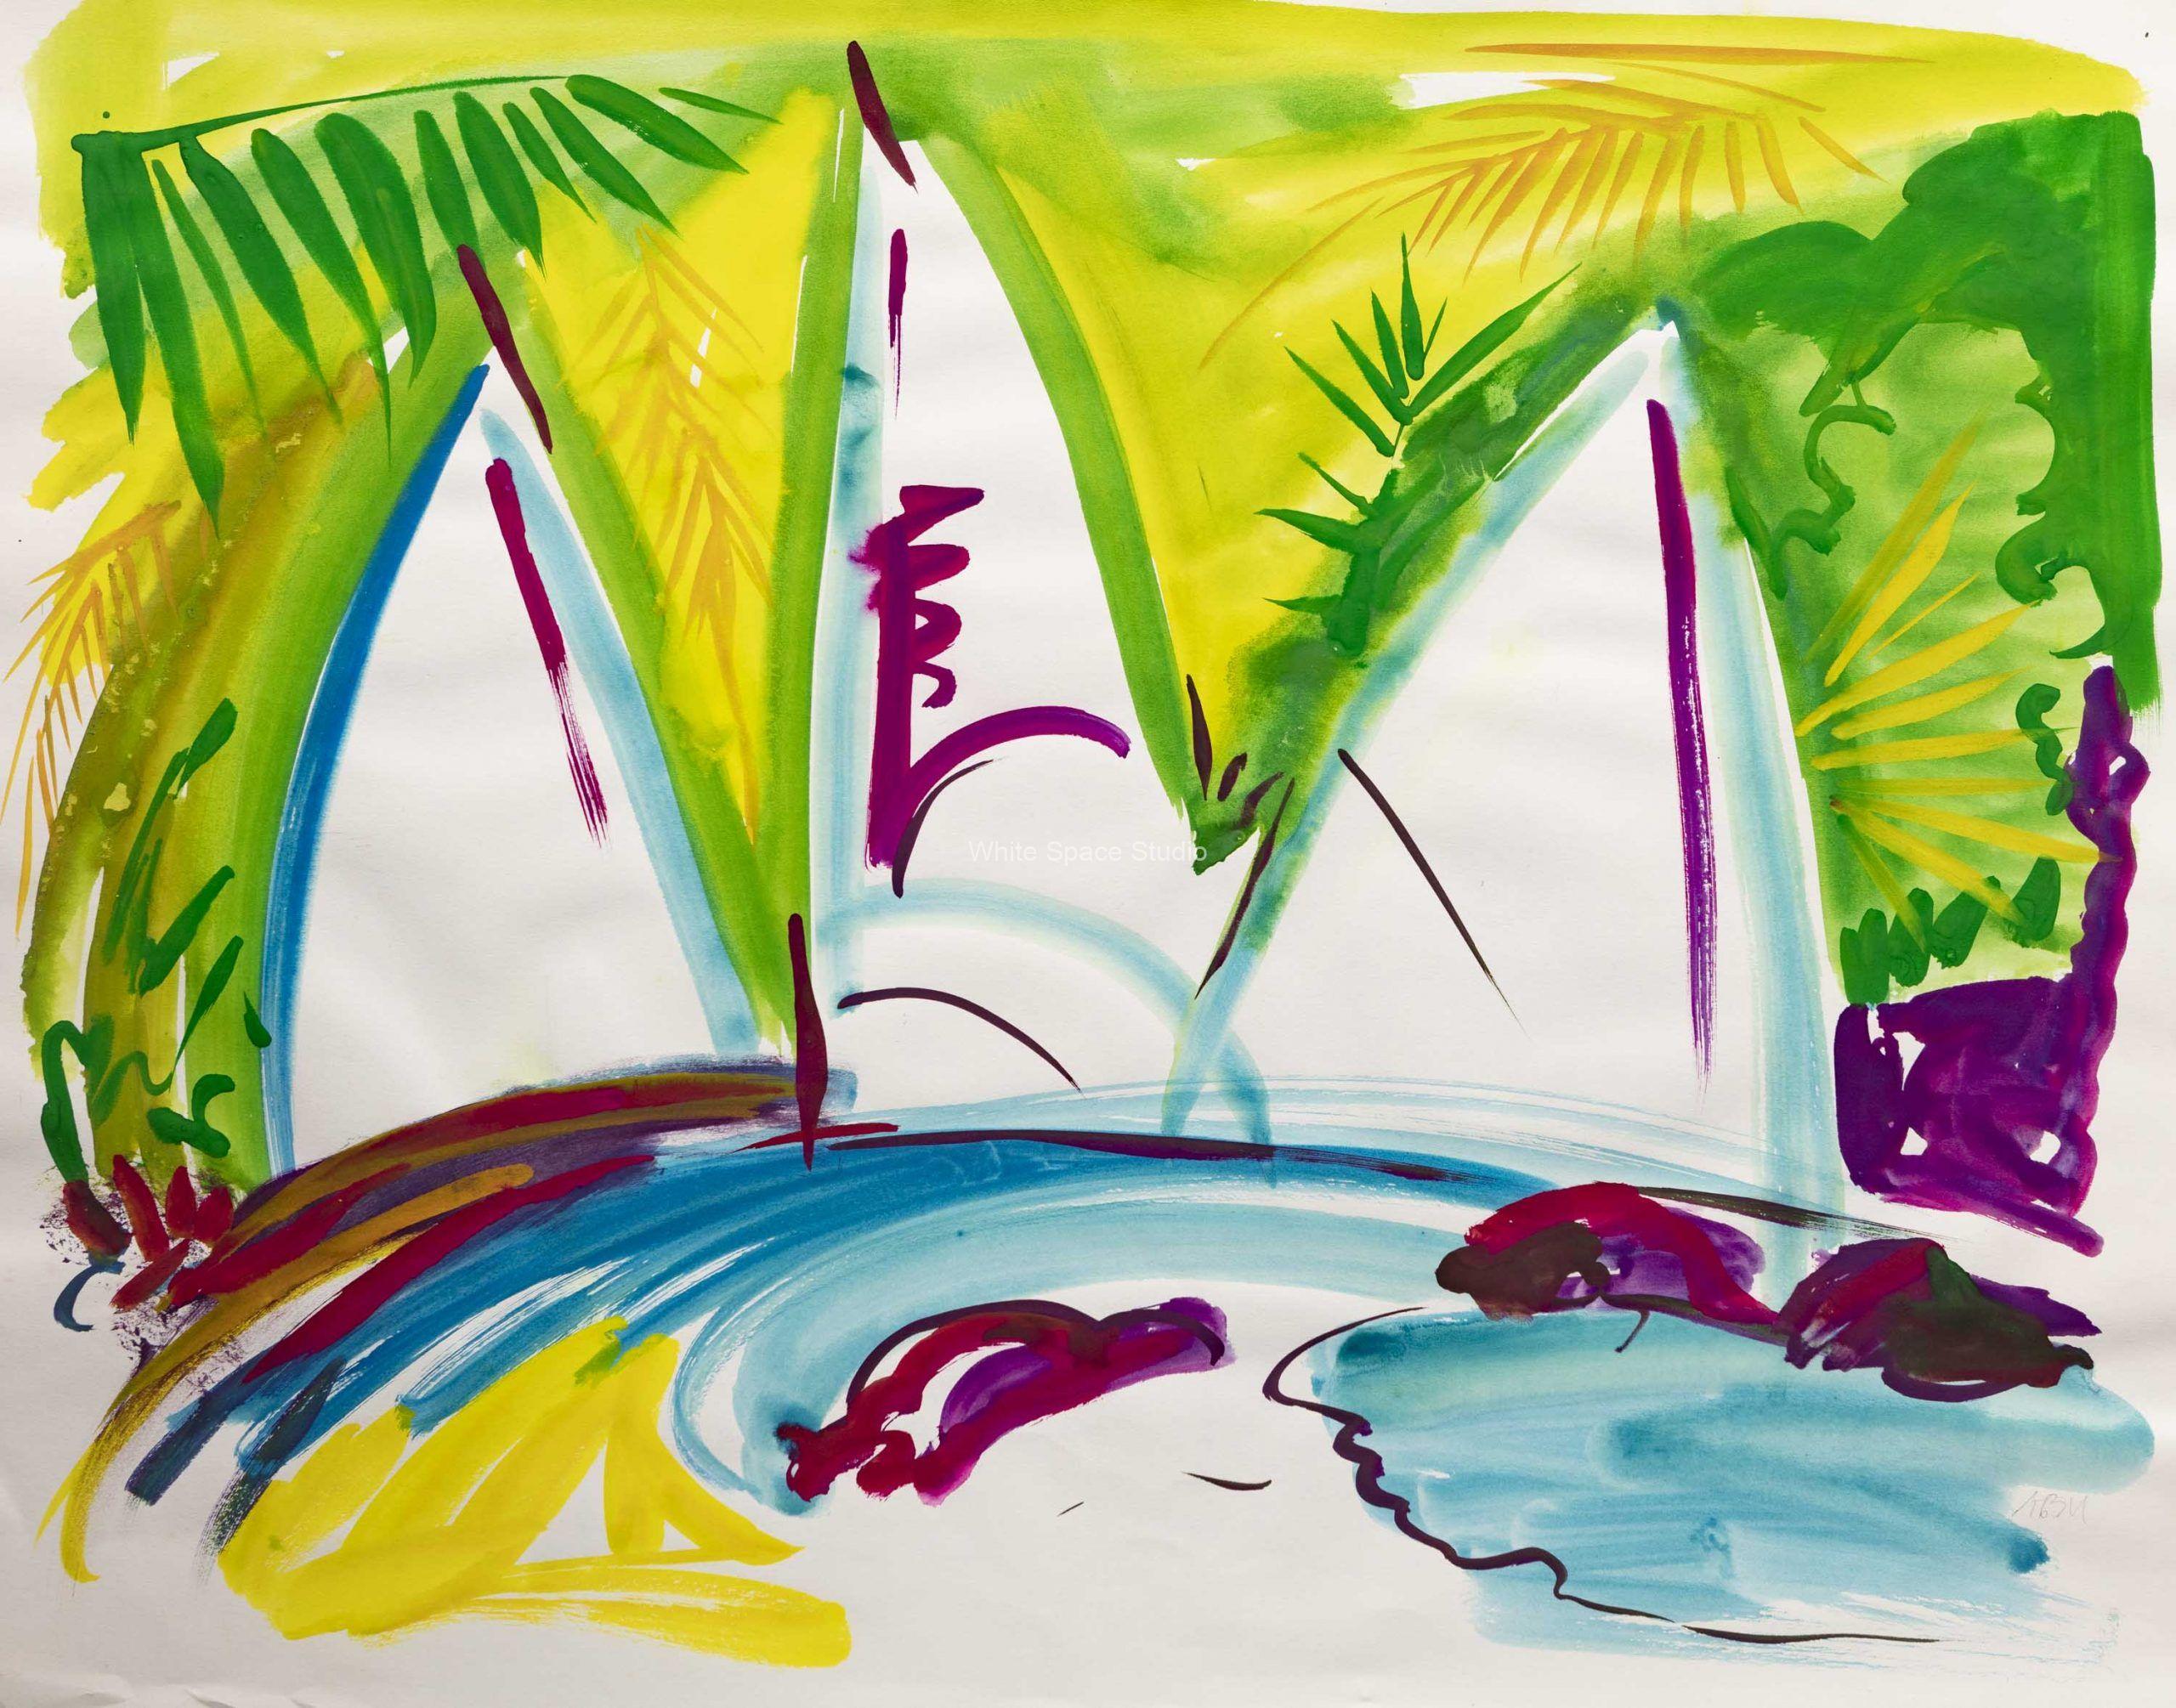 Three Sails Key West Arlene Black Mollo Watercolor Artwork